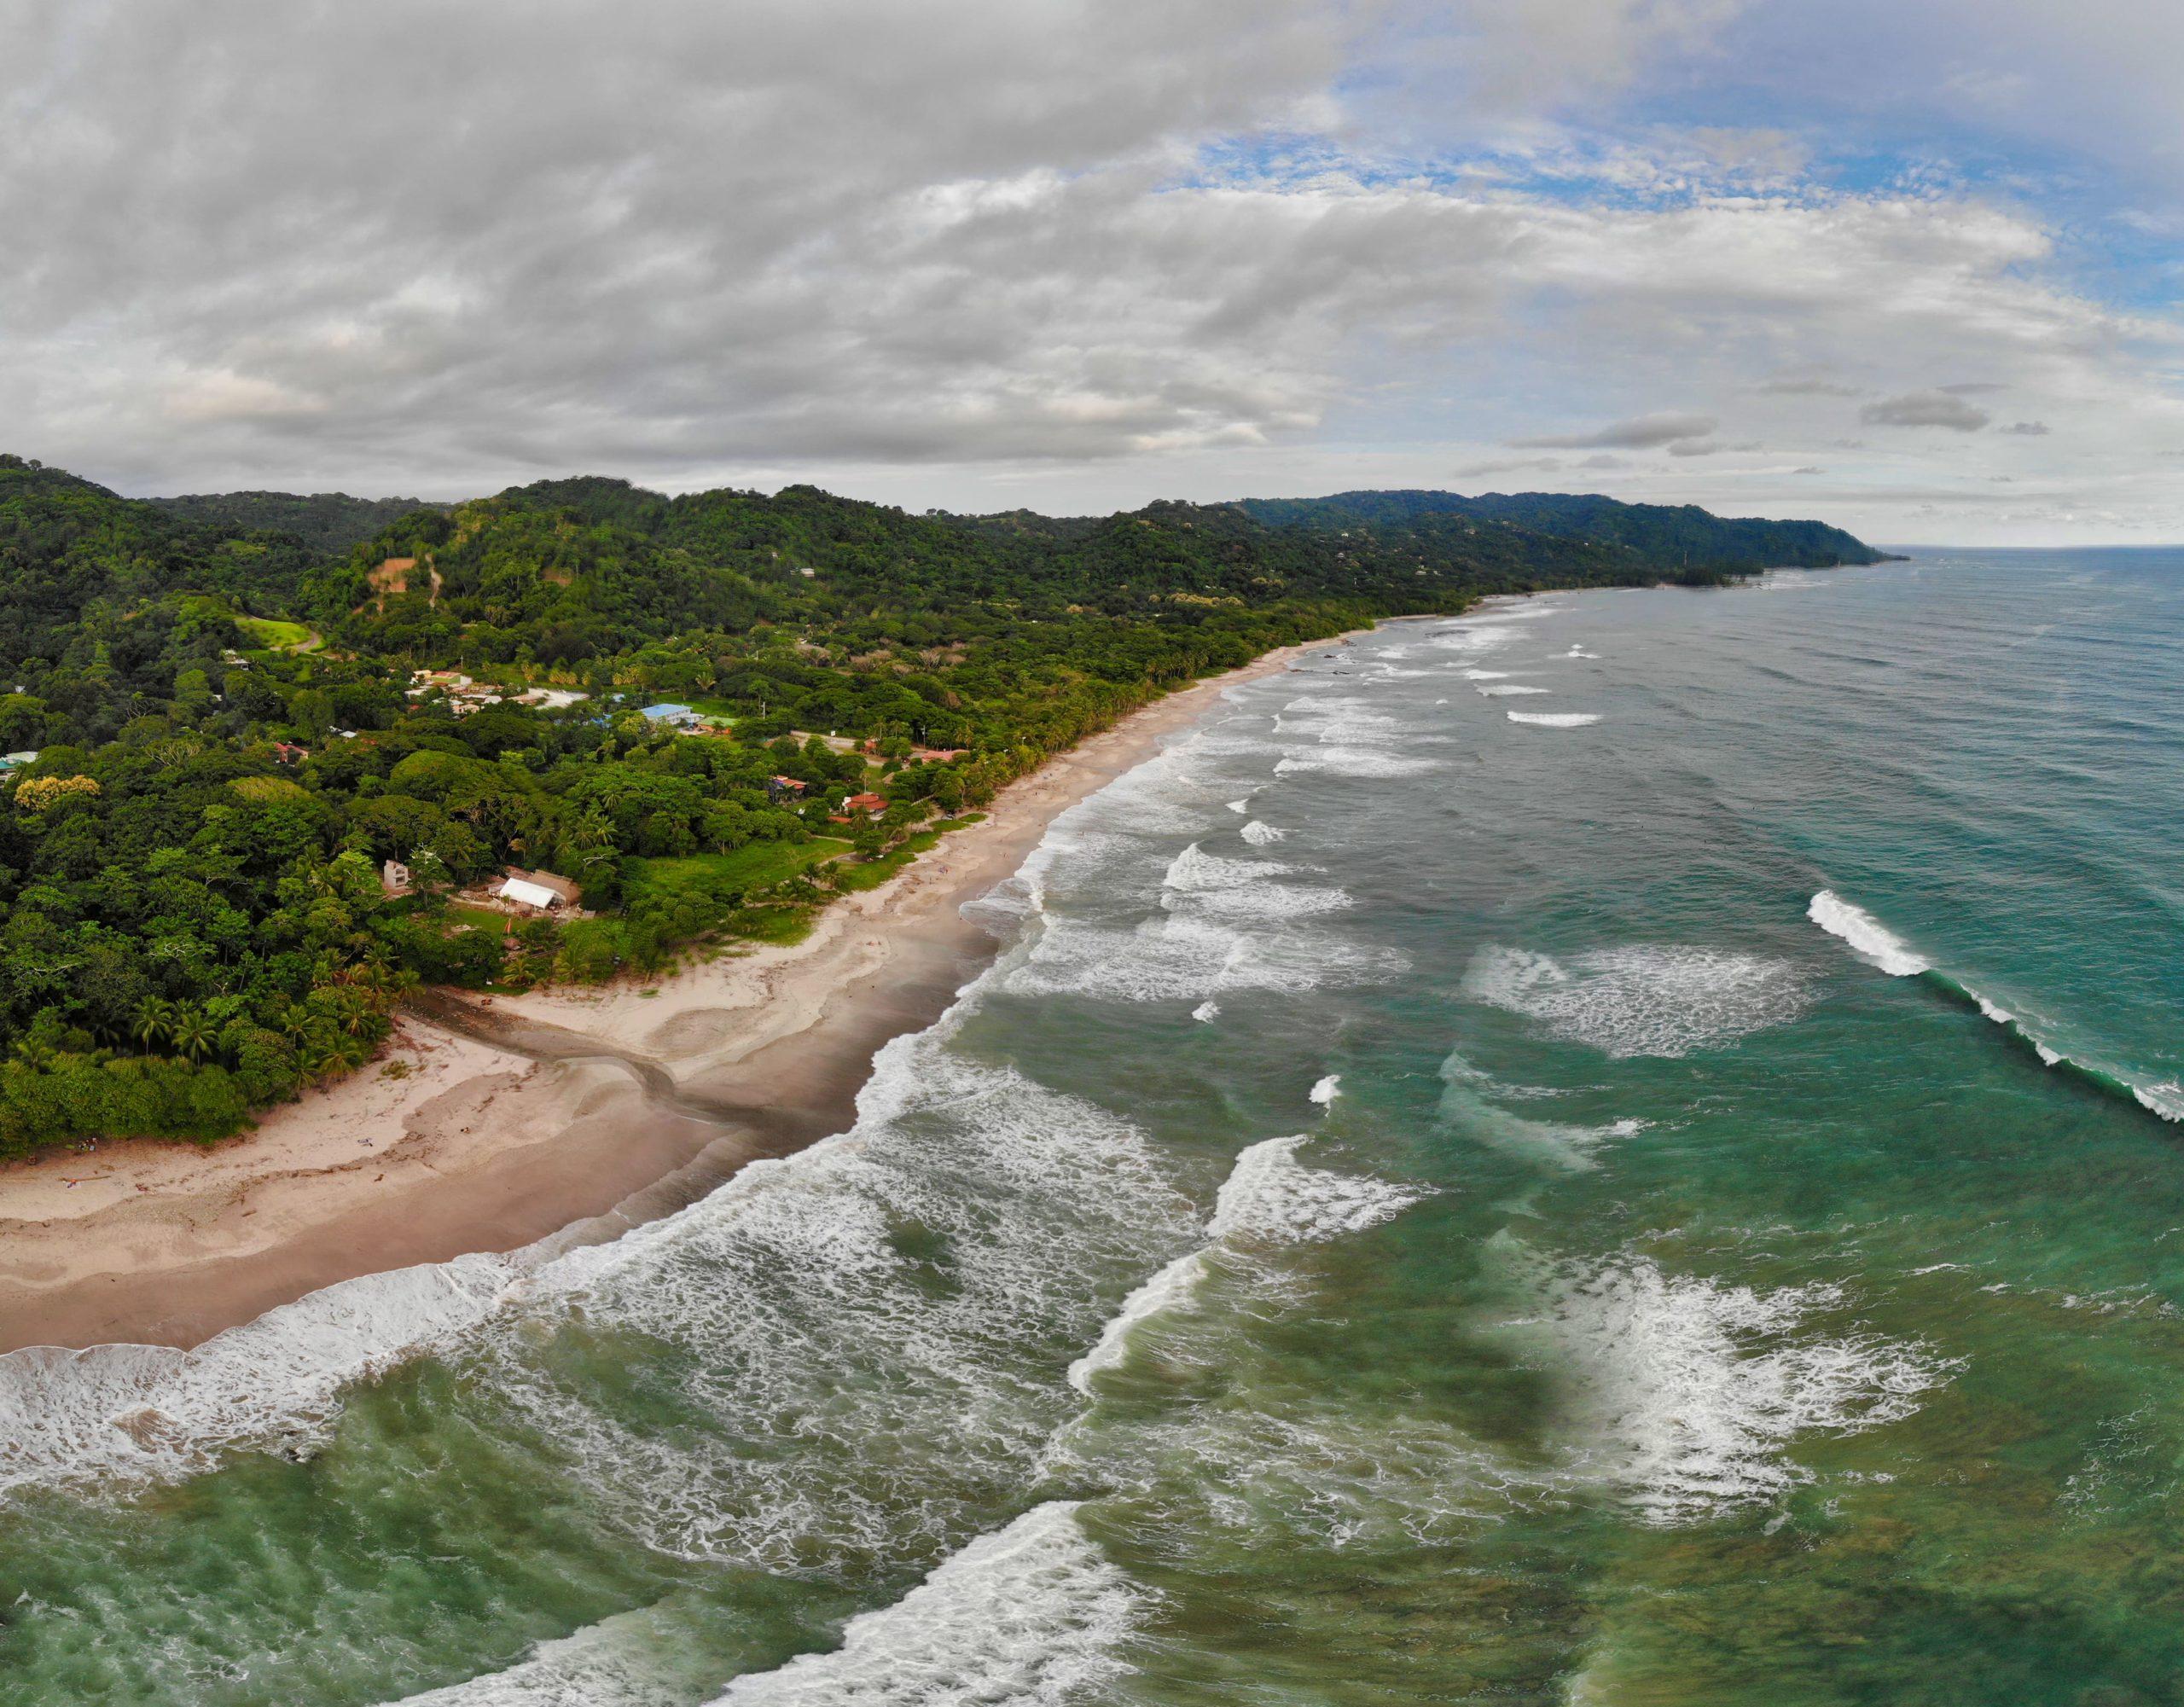 surf spots in santa teresa costa rica